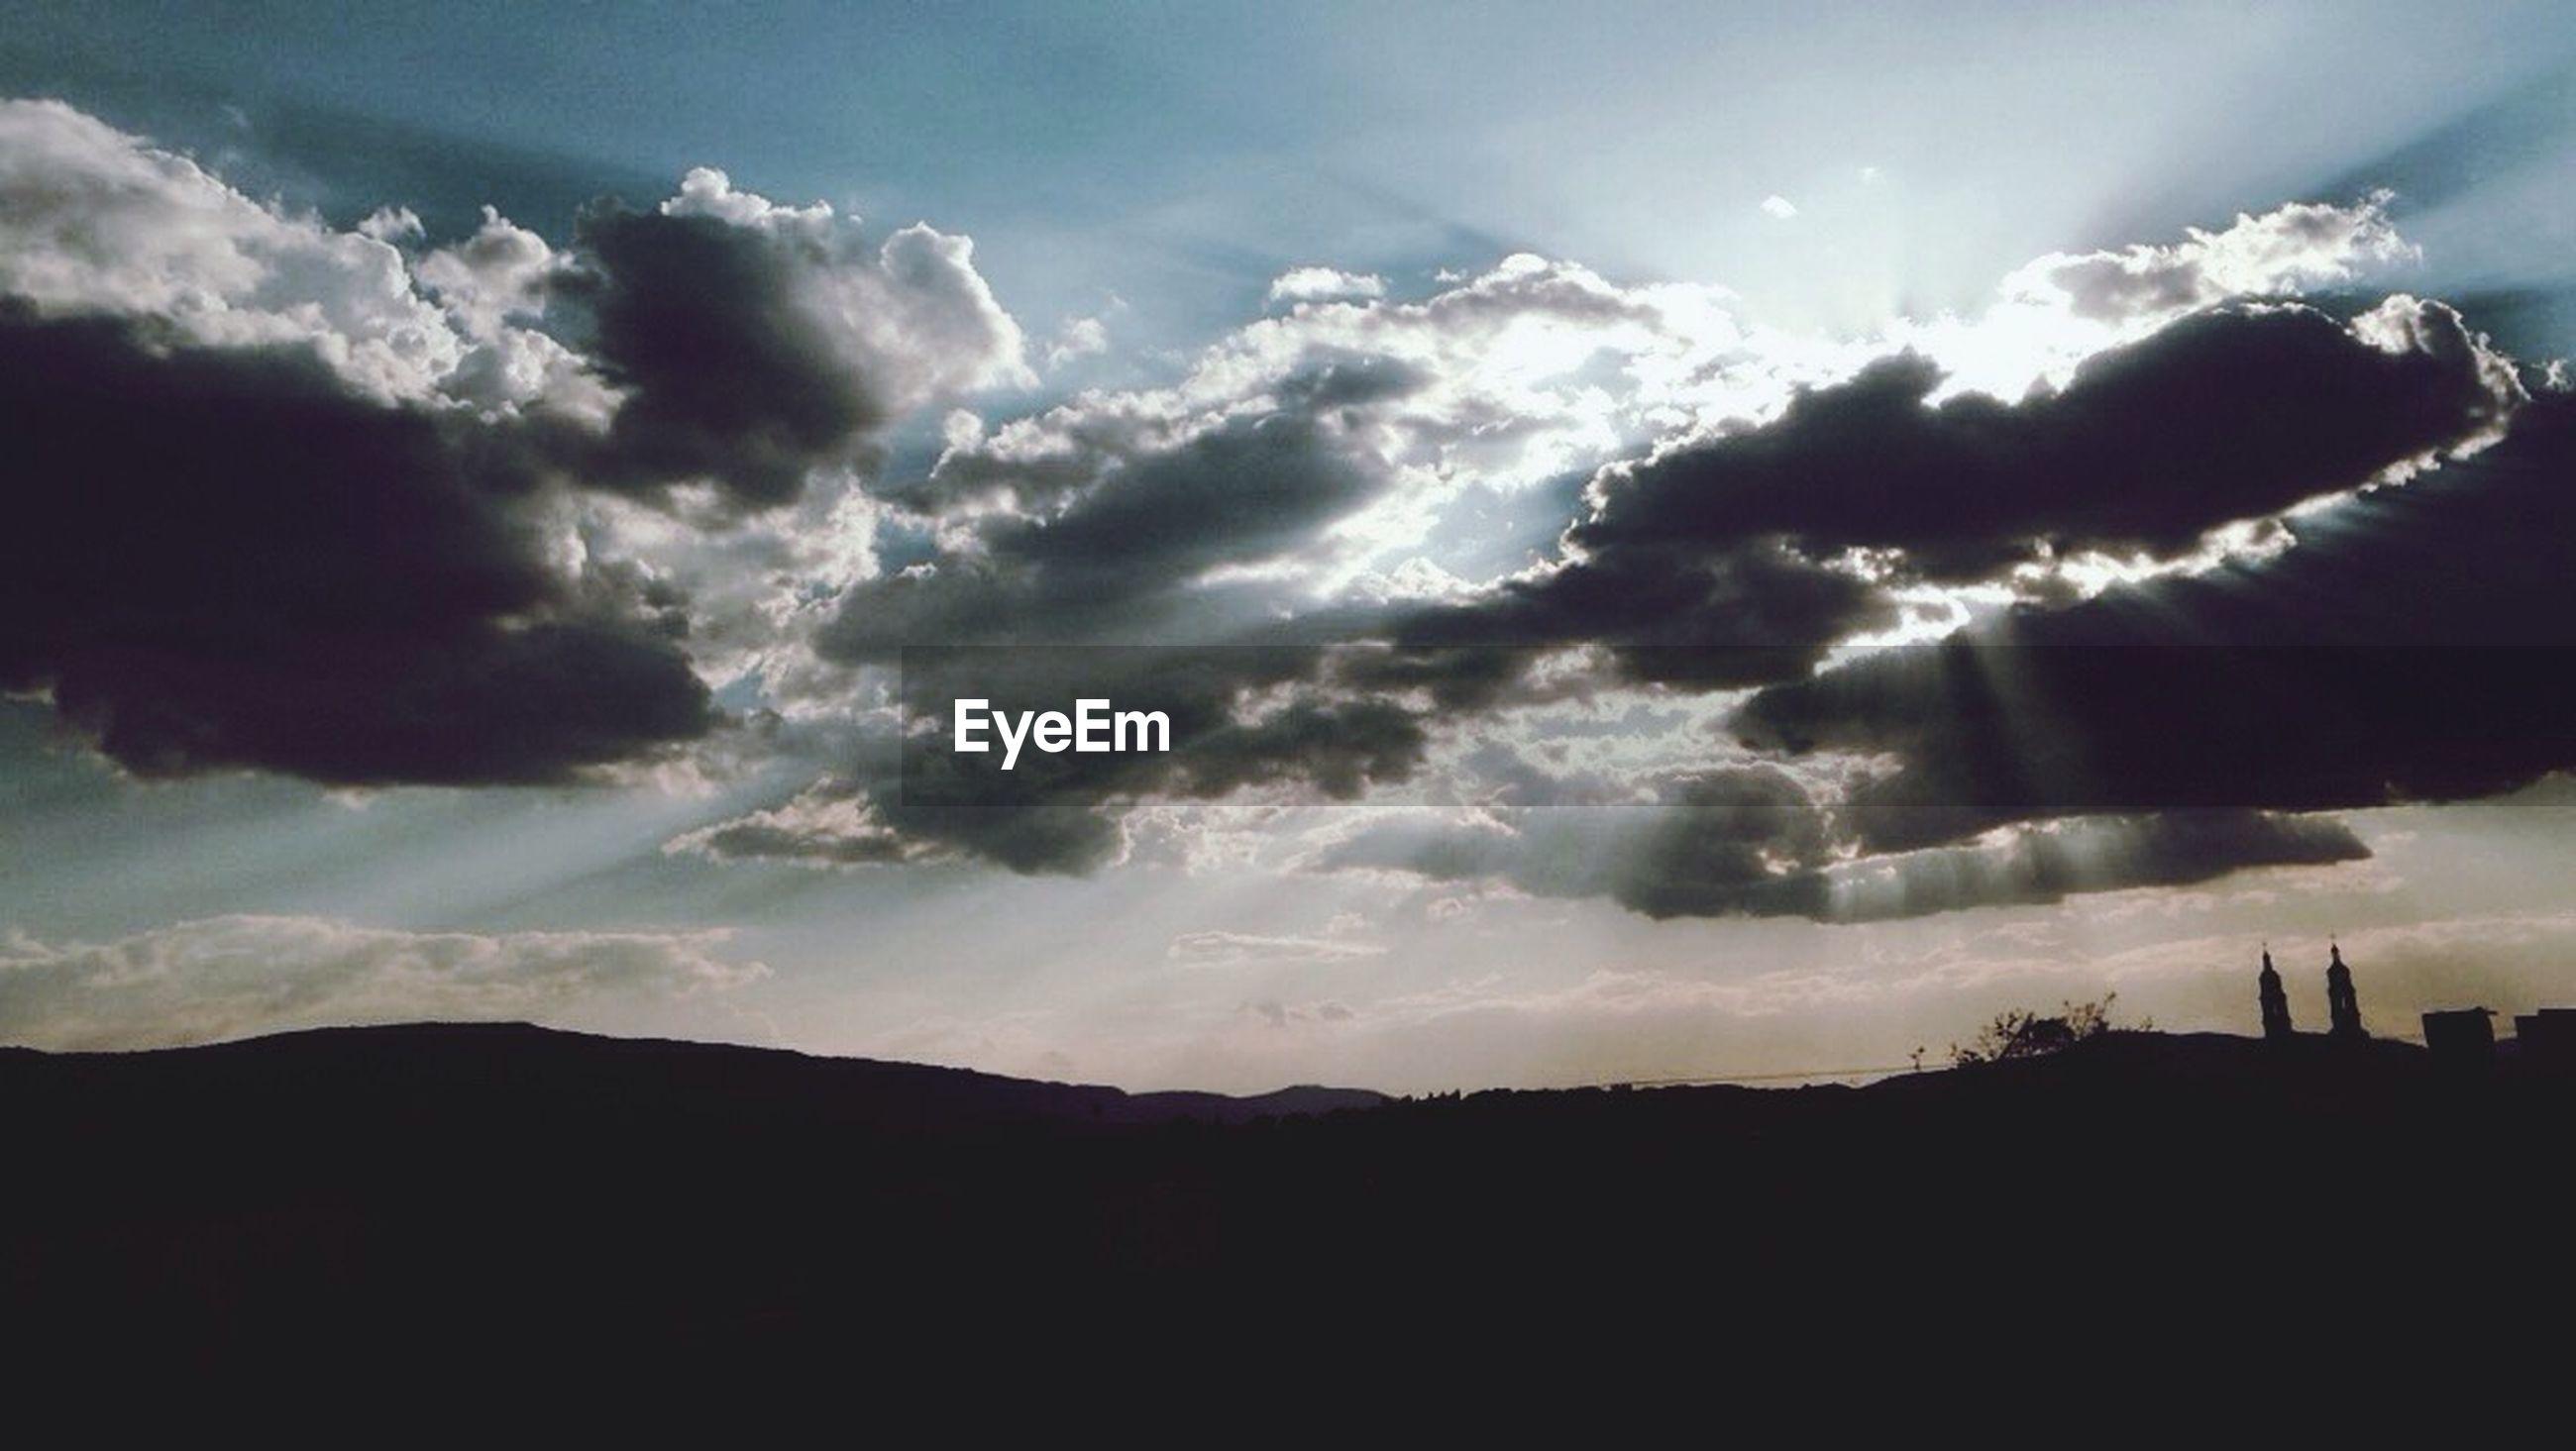 silhouette, sky, tranquil scene, scenics, tranquility, beauty in nature, cloud - sky, sunset, landscape, nature, mountain, cloud, idyllic, cloudy, sunbeam, sun, sunlight, non-urban scene, outdoors, remote